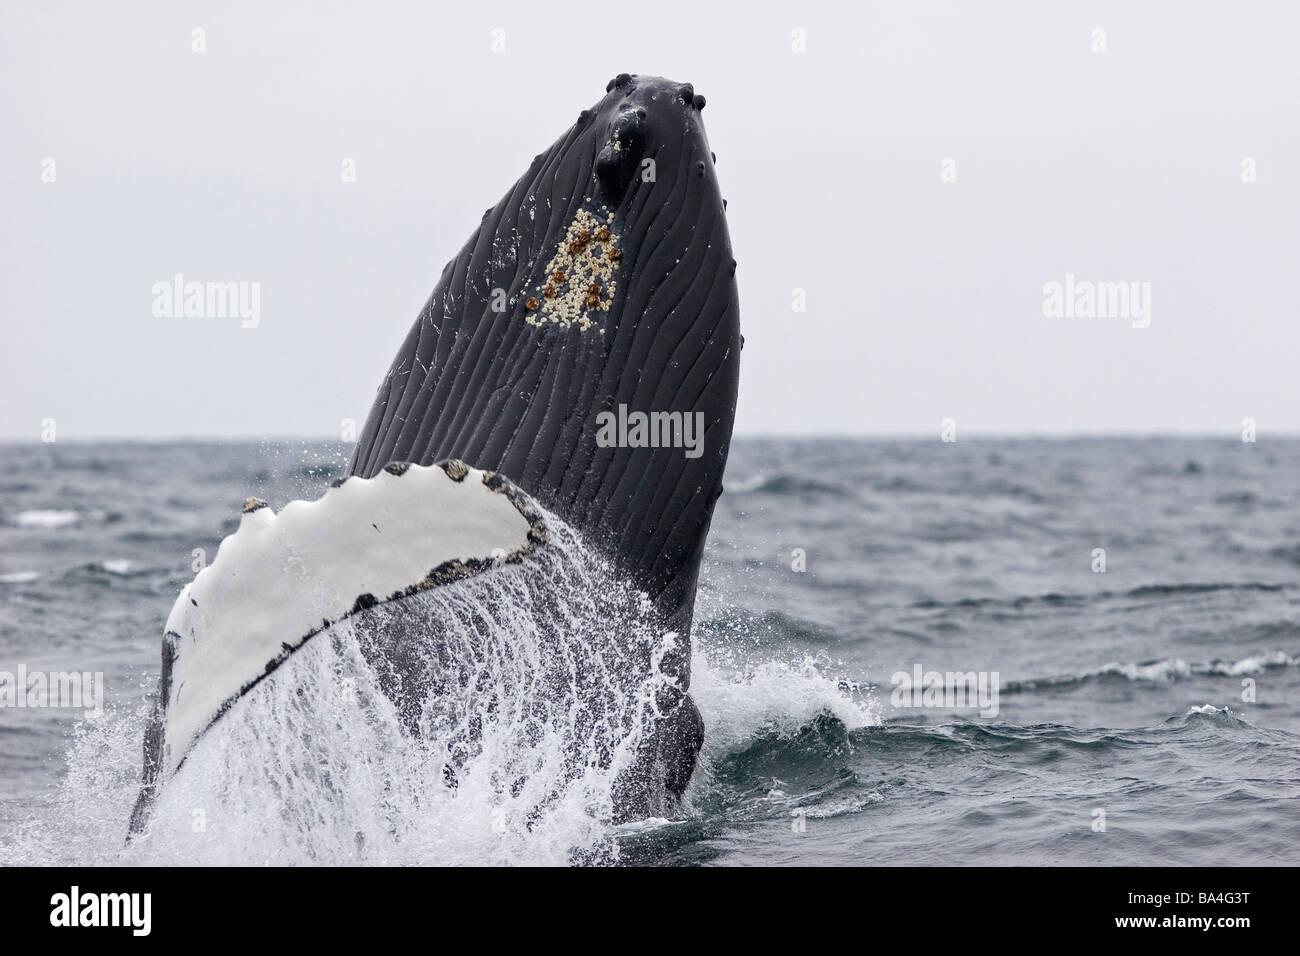 North Atlantic humpback whale breaching - Stock Image